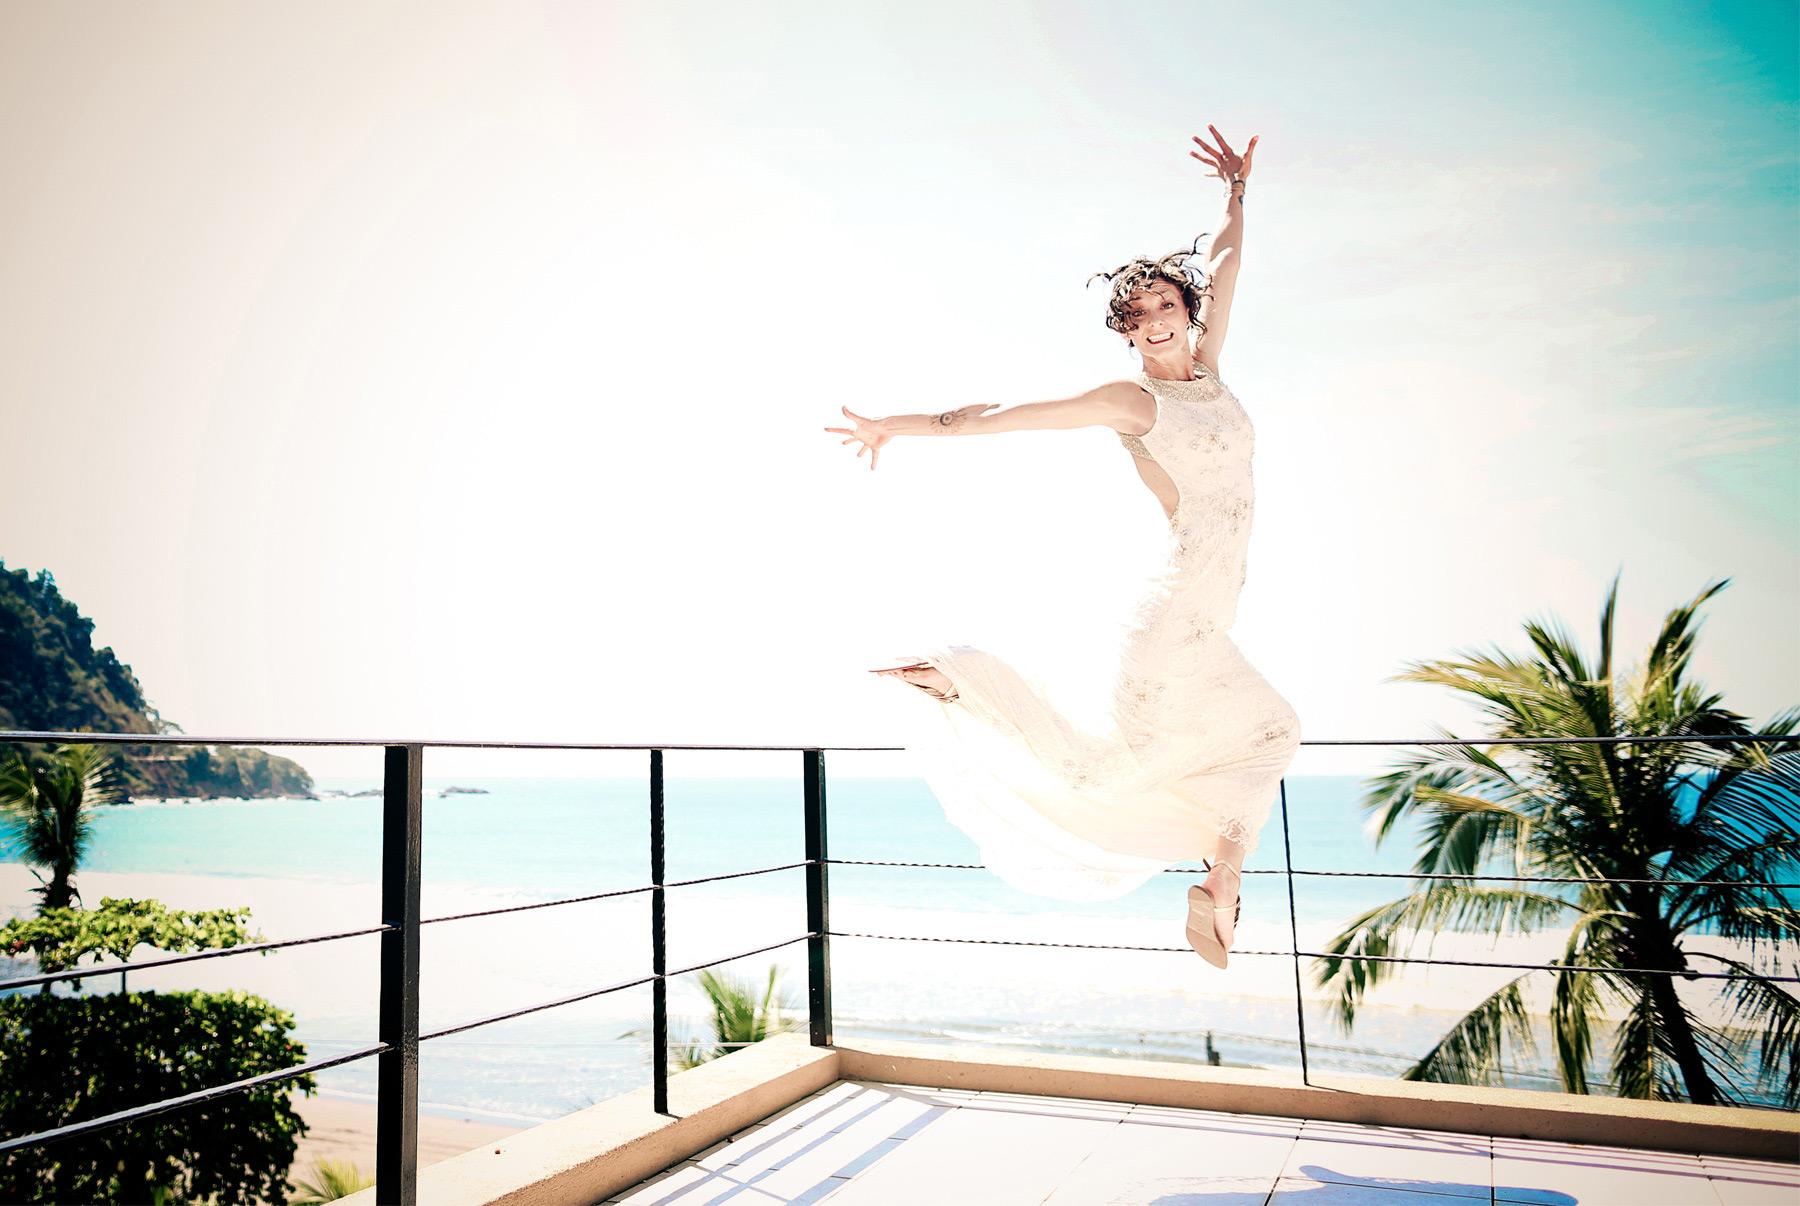 03-Costa-Rica-Wedding-Photography-by-Vick-Photography-Jaco-Tropical-Beach-Villa-Caletas-Resort-Alli-and-Duncan.jpg